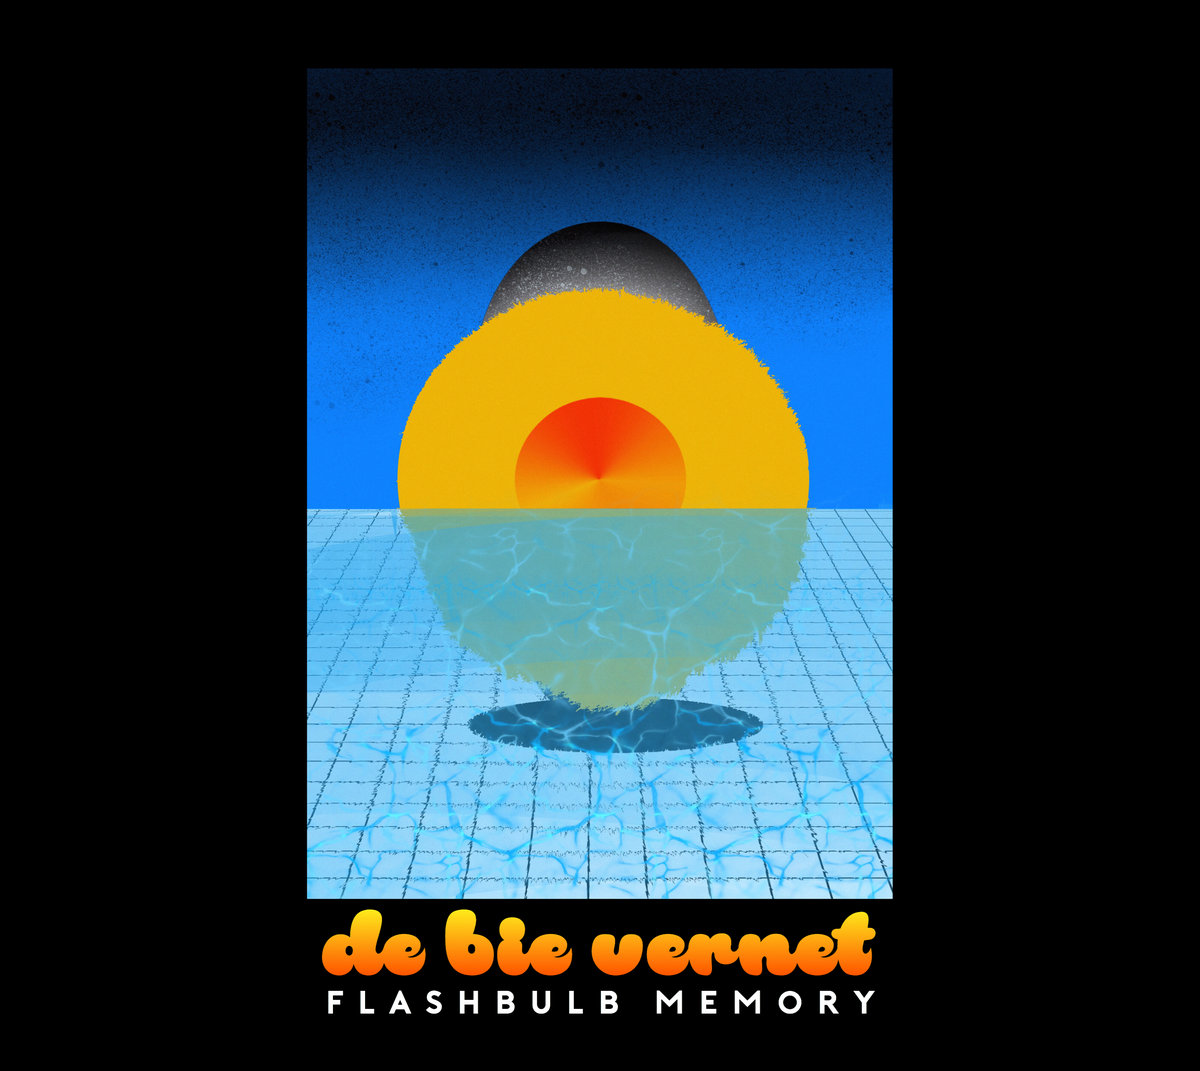 Vania De Bie-Vernet – Flashbulb Memory